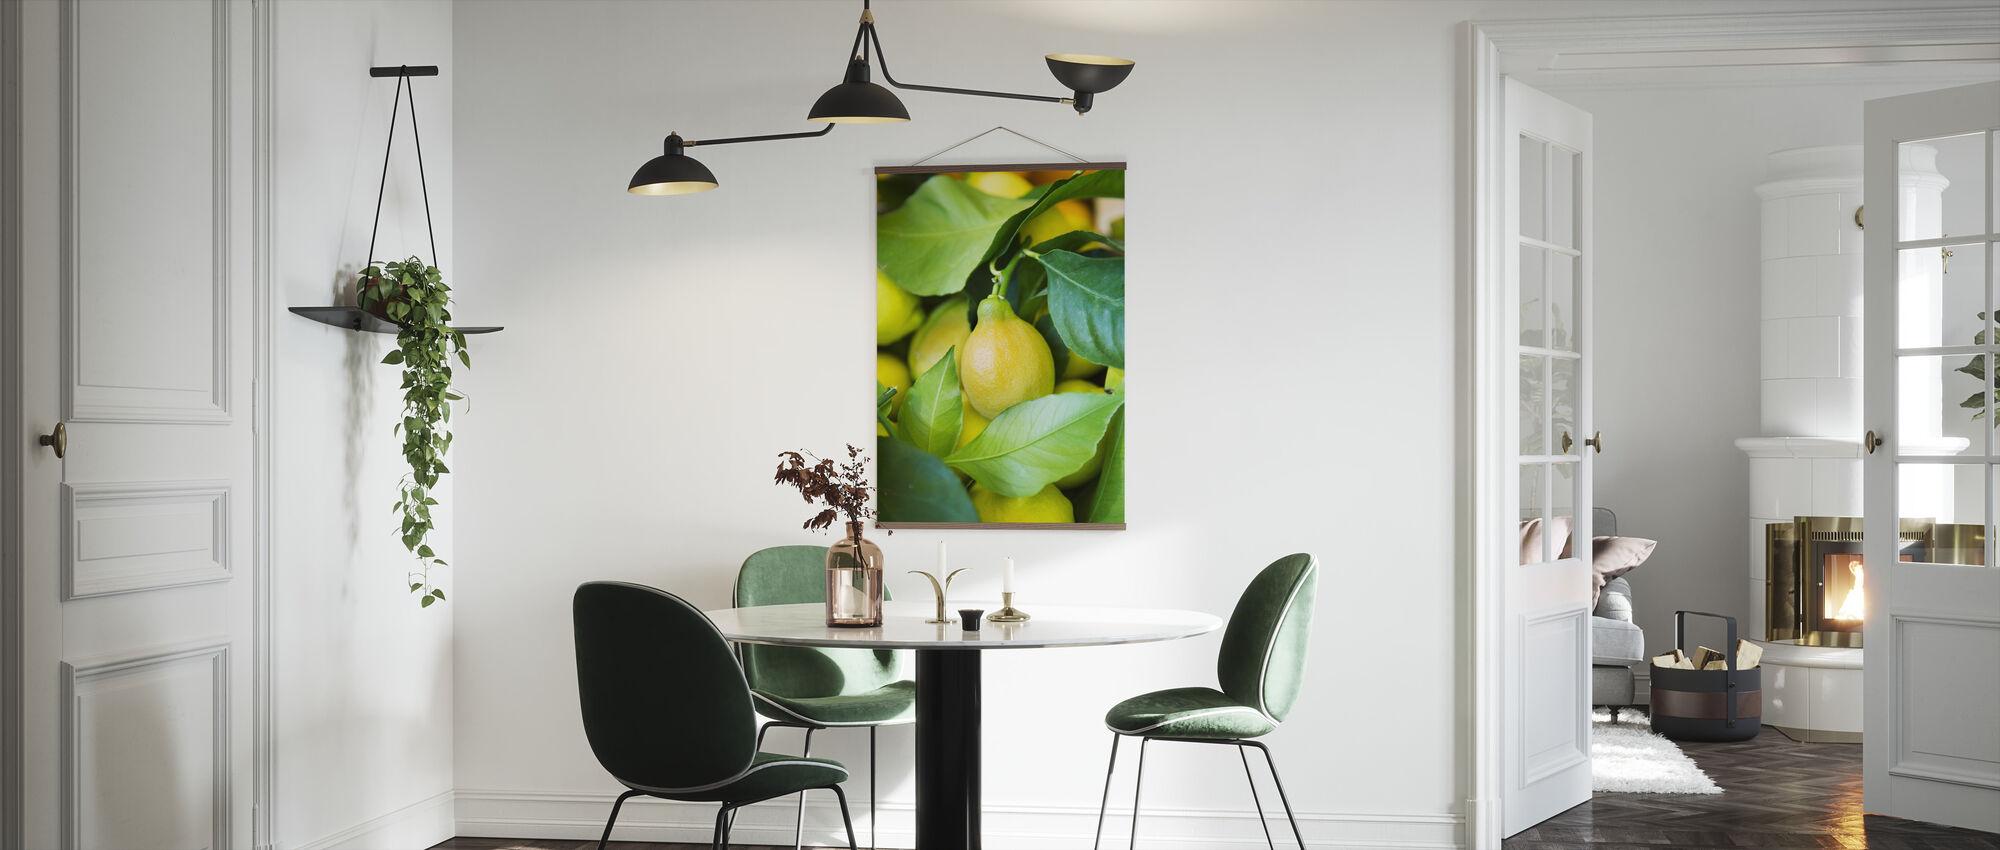 French Lemon - Poster - Kitchen